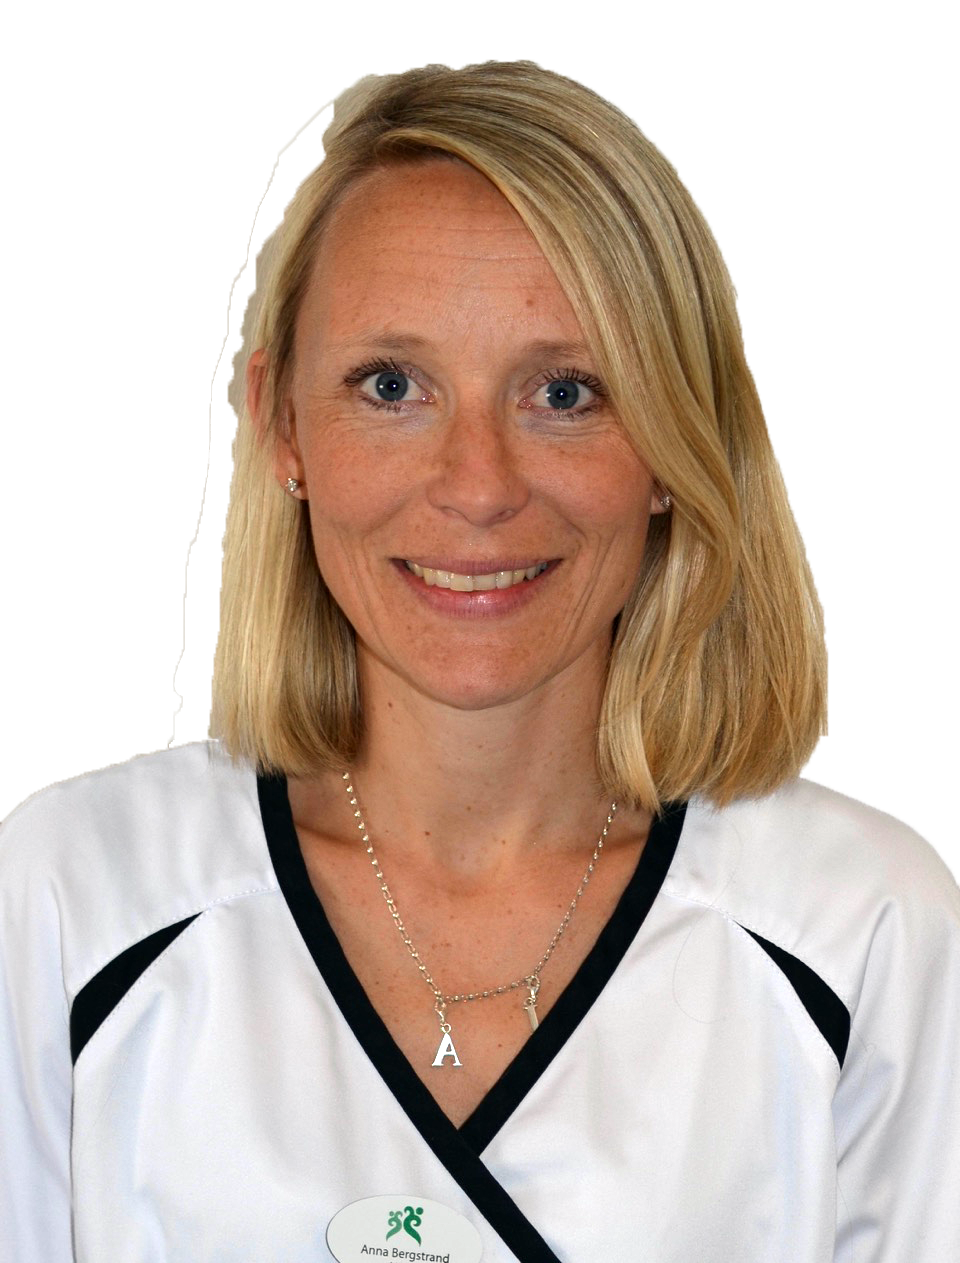 Anna Bergstrand